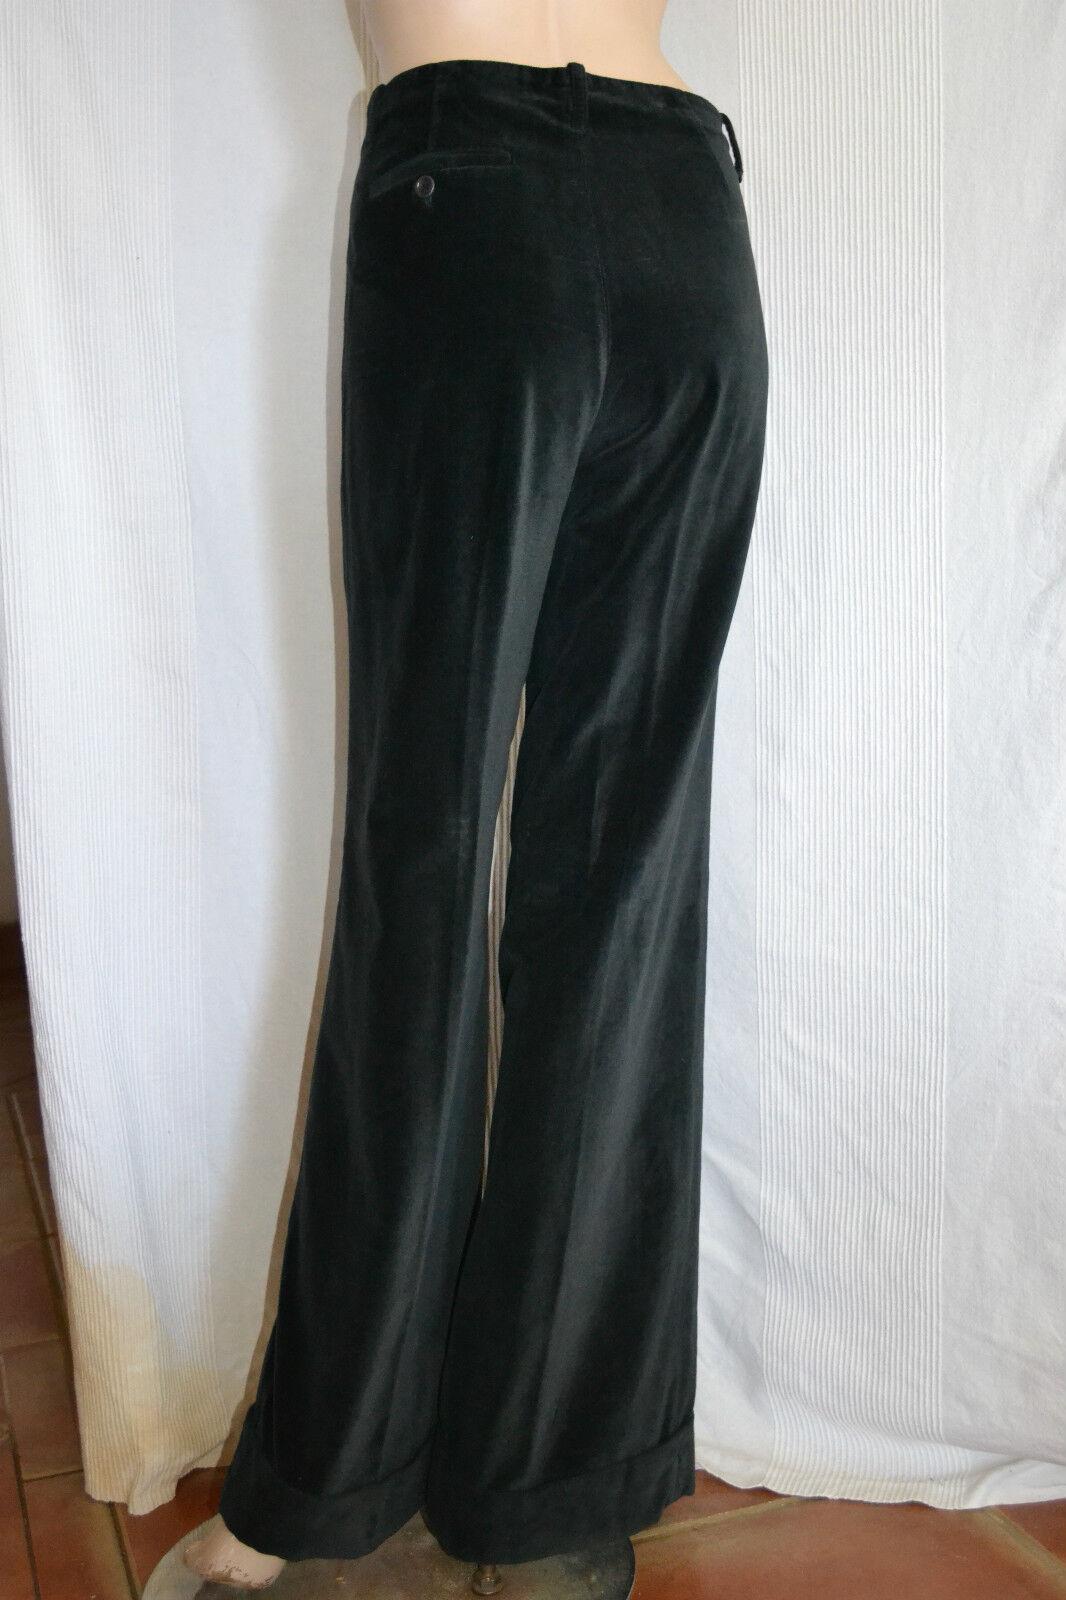 Original HACHE Samt Hose trousers velvet pantalon M 38 40 neu  NEW schwarz